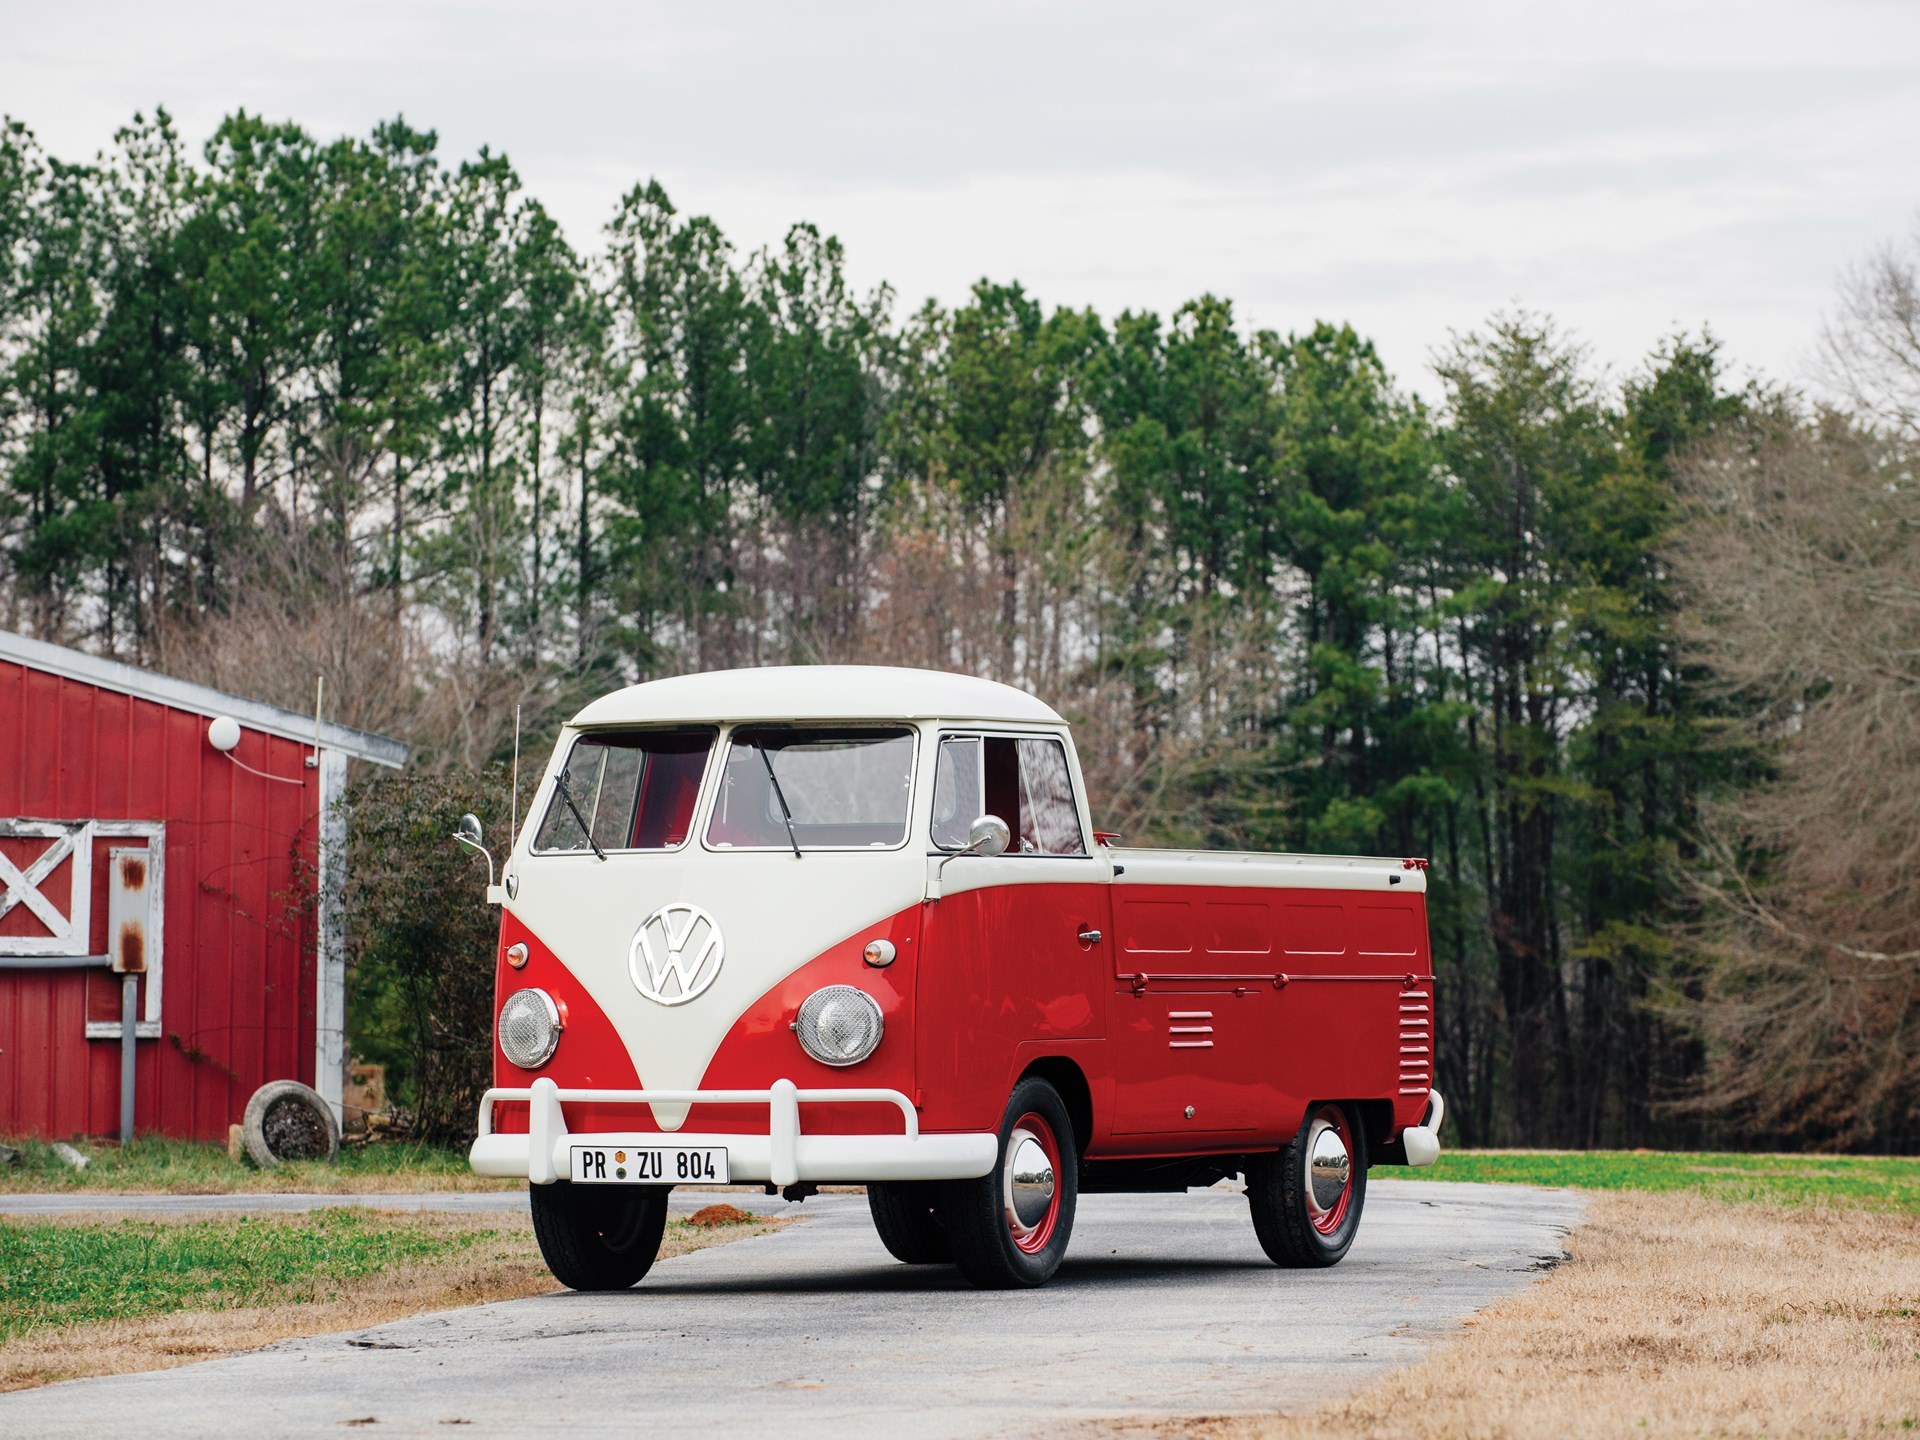 1961 Volkswagen Single-Cab Pickup front 3/4